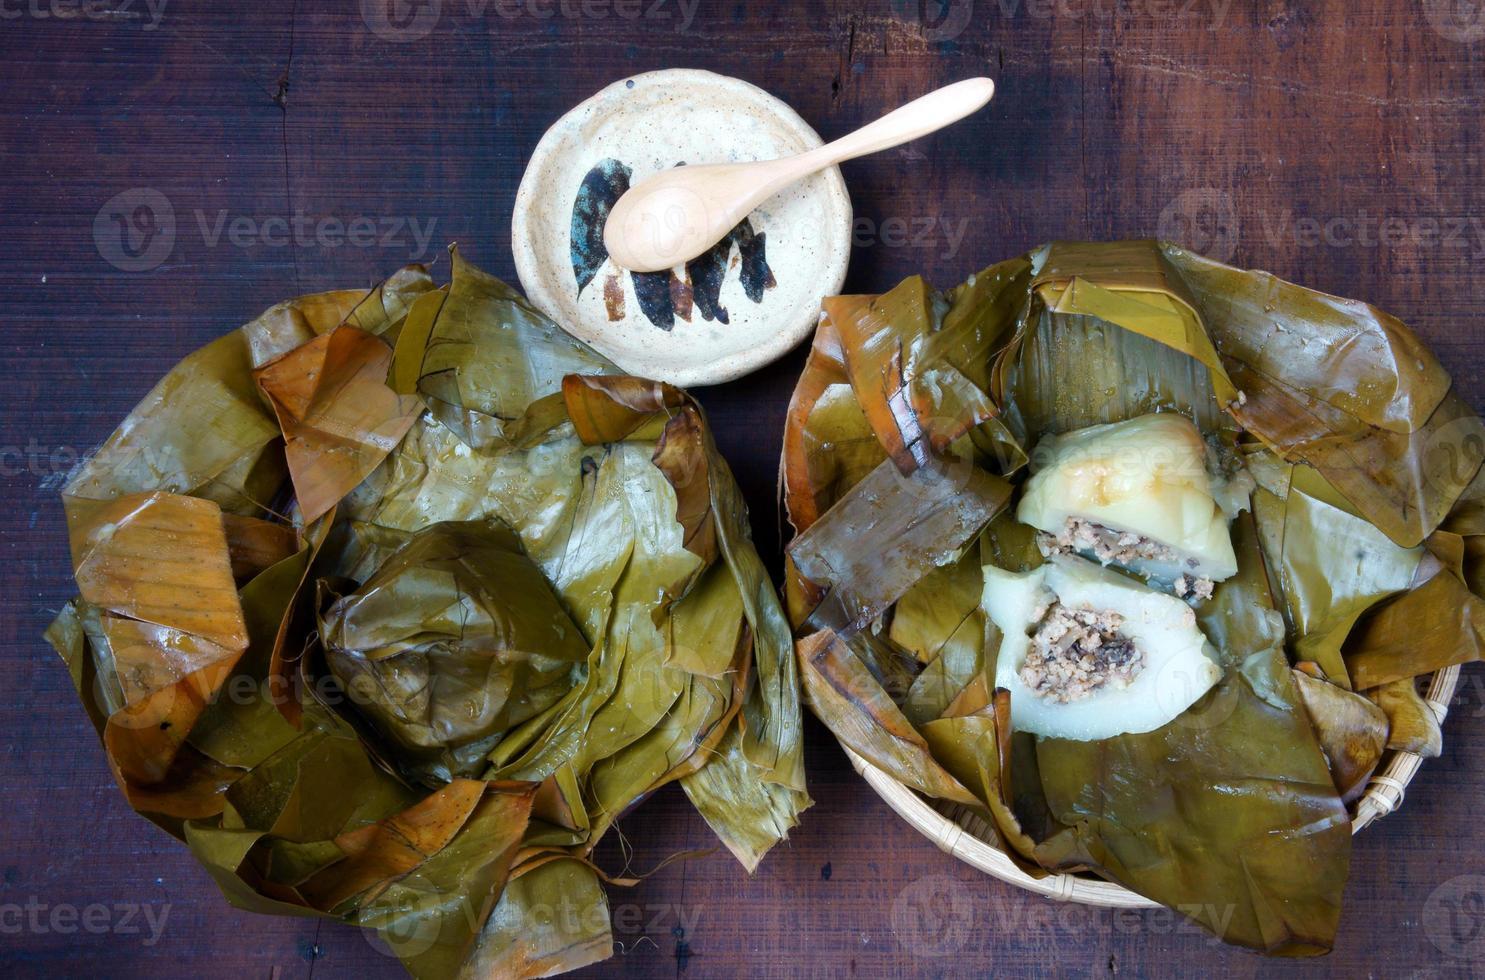 comida vietnamita, bola de masa de arroz piramidal foto